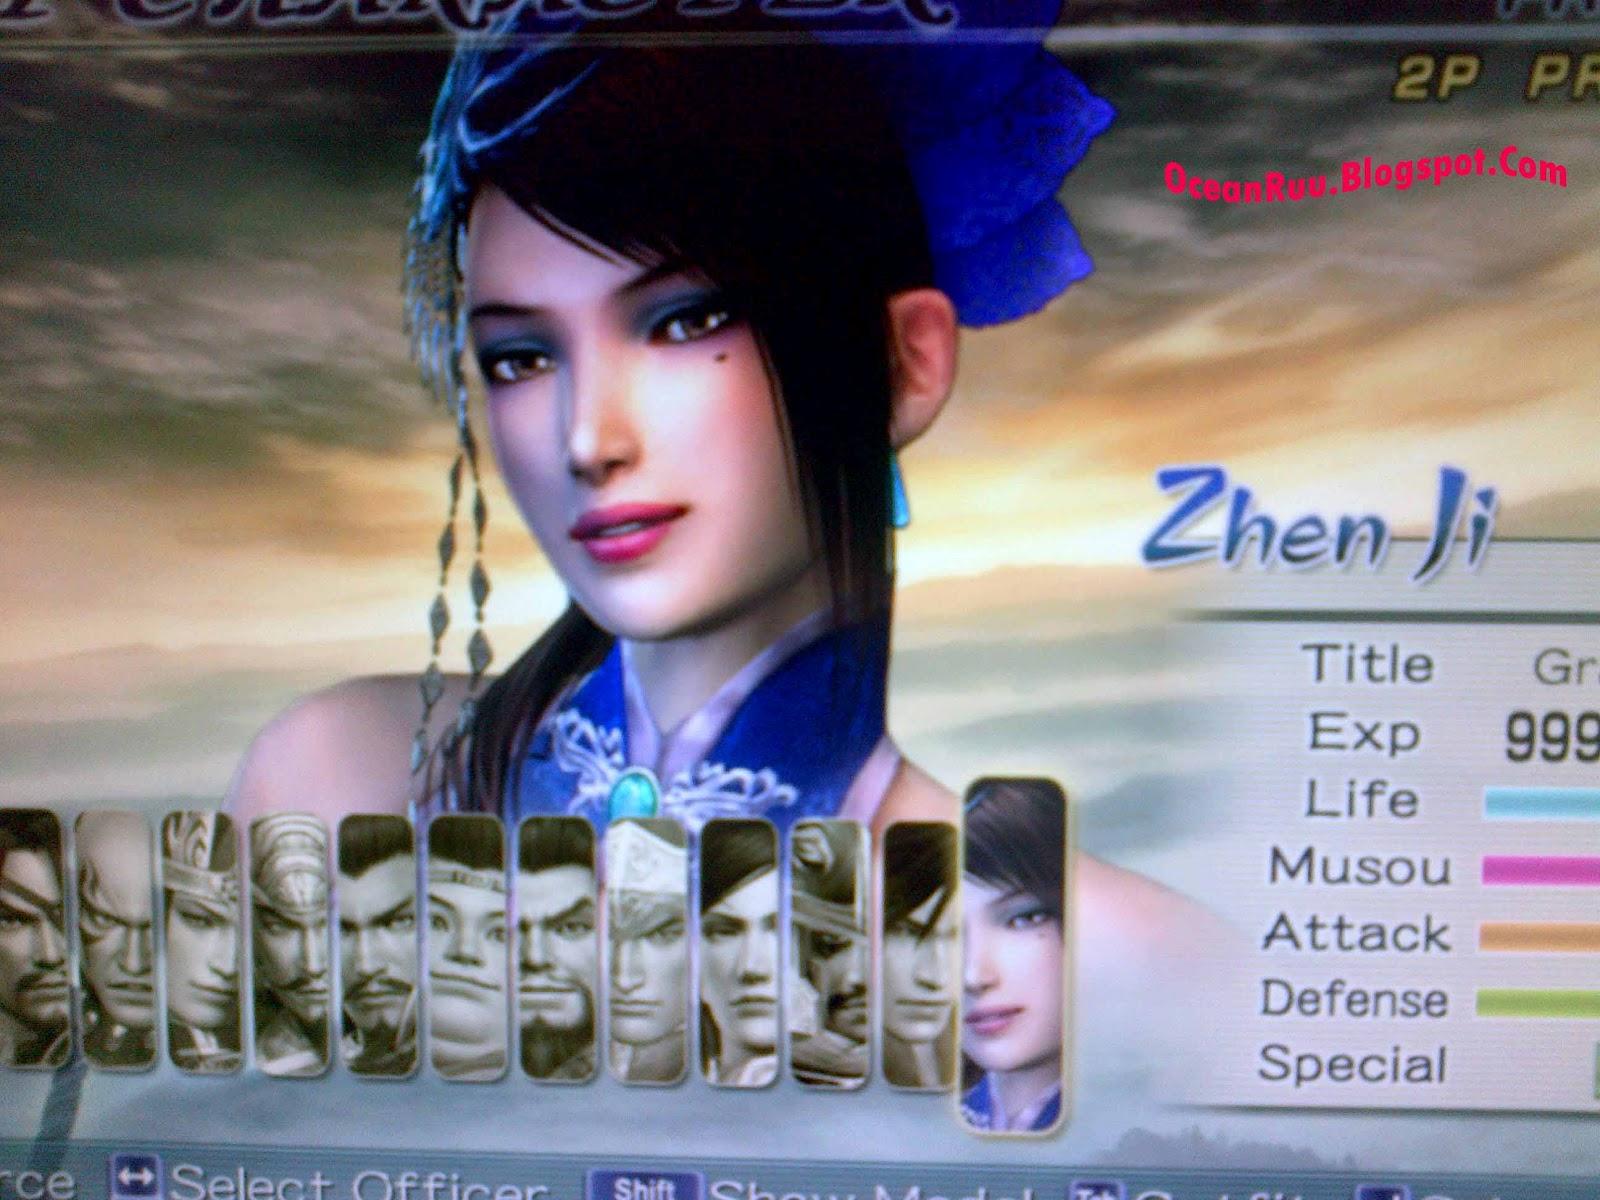 dynasty warriors 6 zhen ji ending a relationship